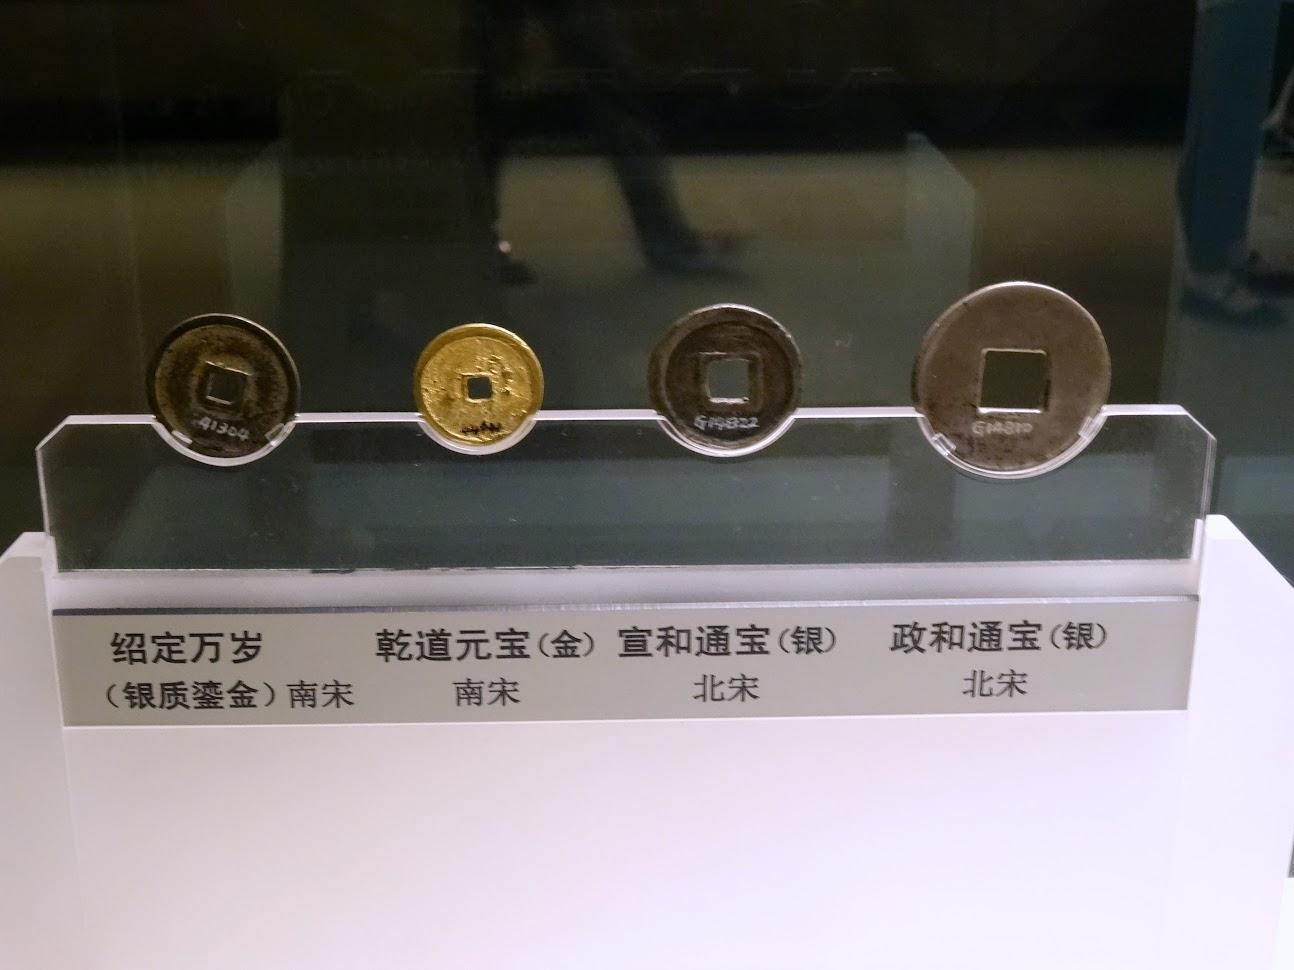 Monnaie Chinoise au Musée de Shanghai